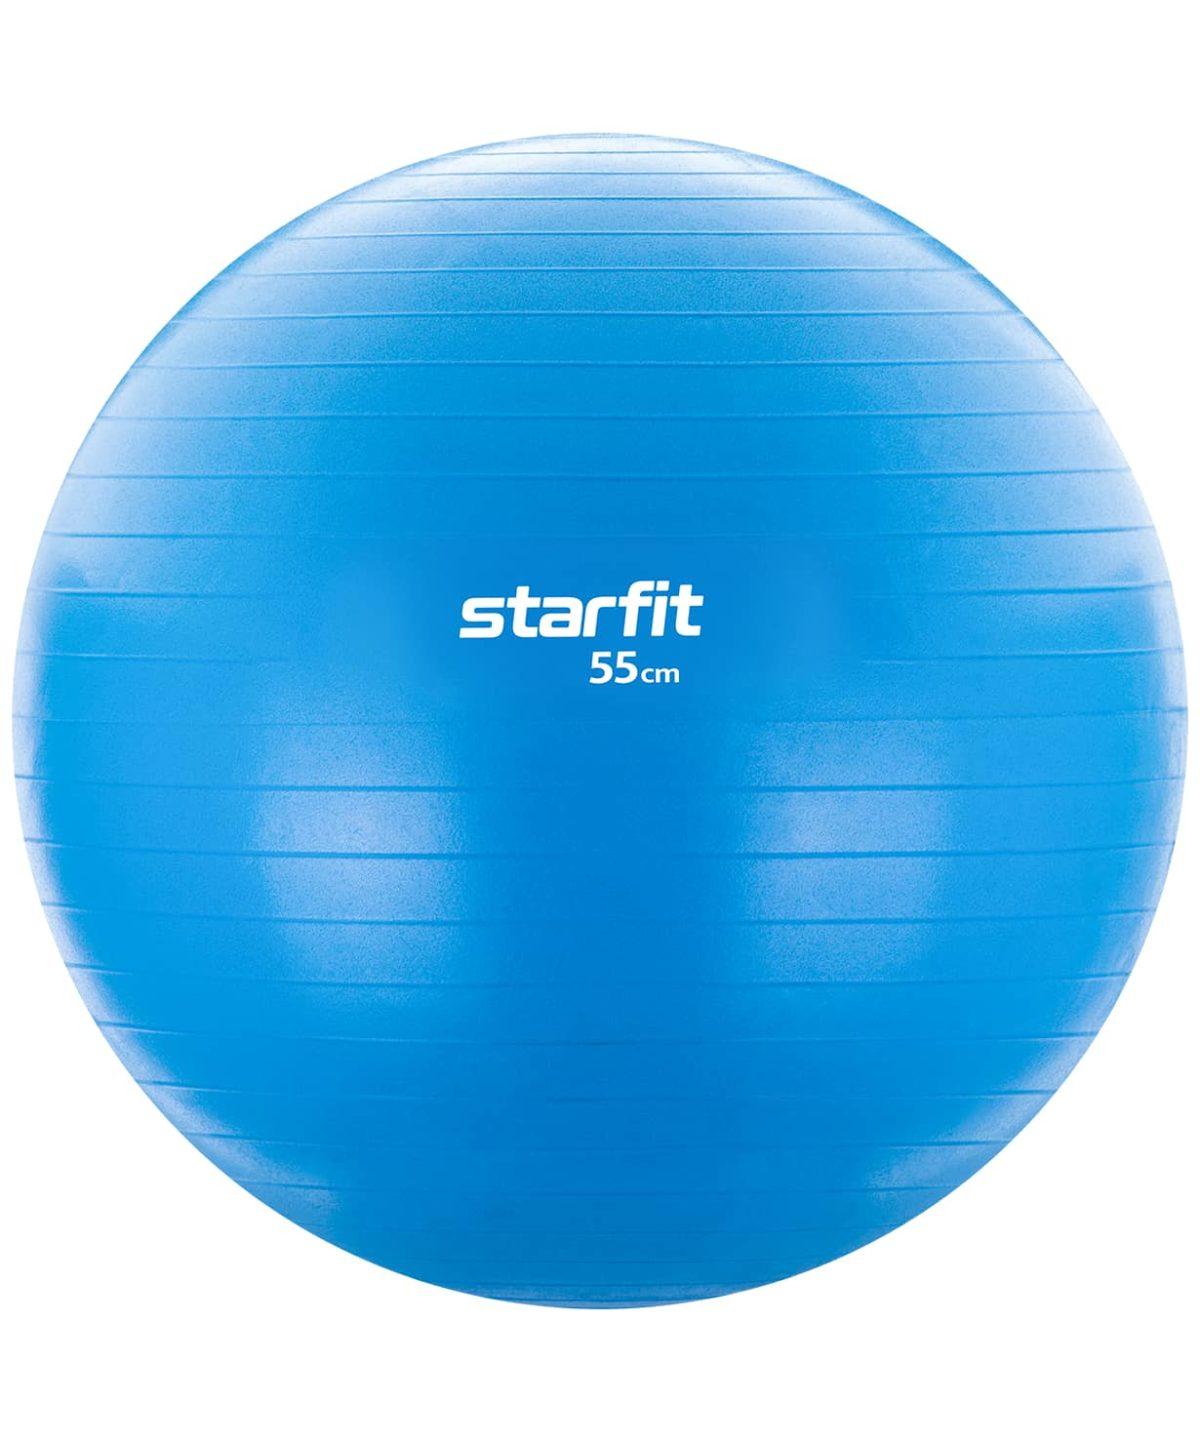 STARFIT Фитбол антивзрыв 55см, 900гр, без насоса GB-104 - 1